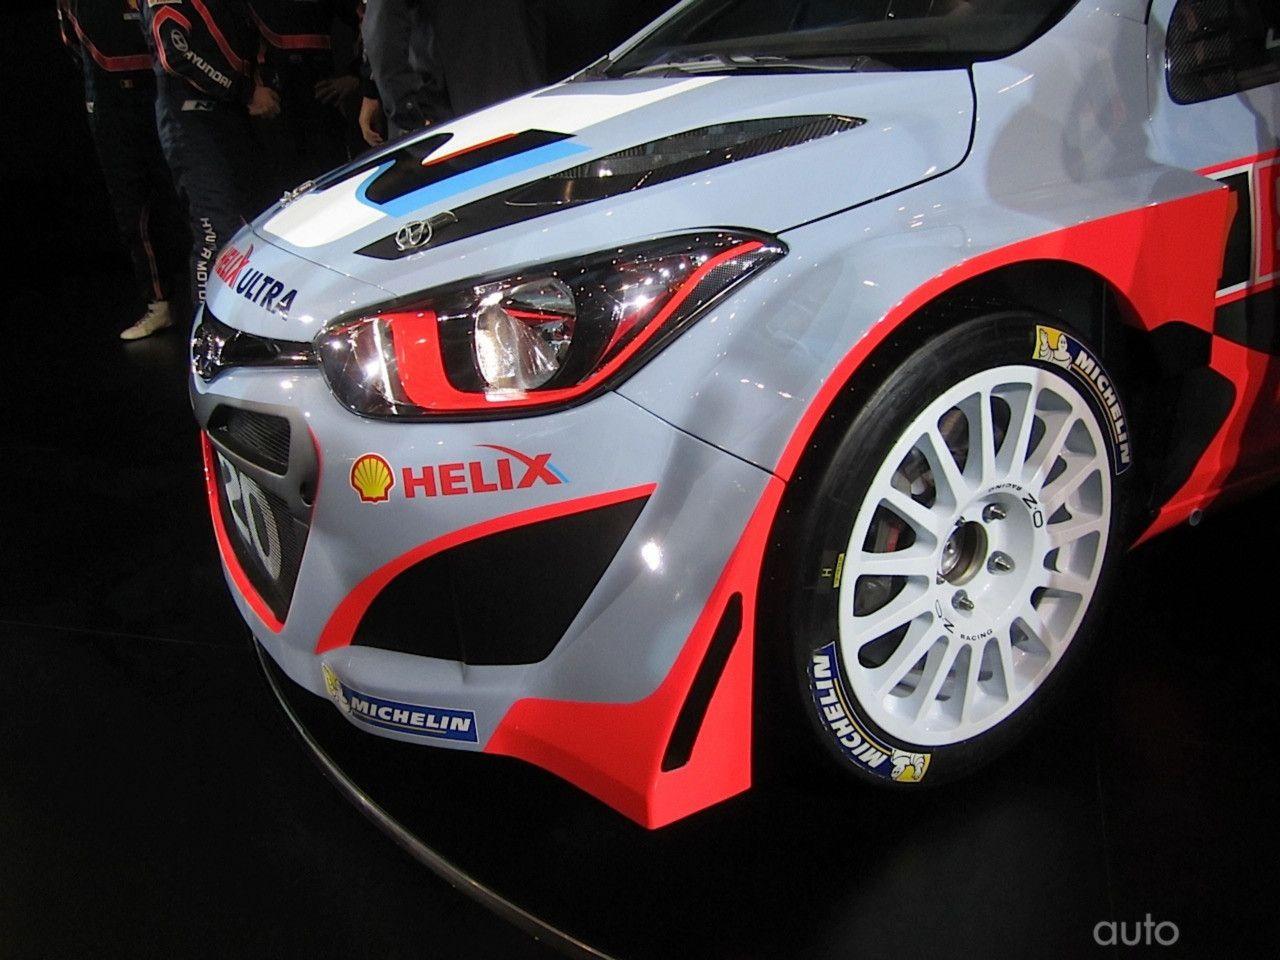 Hyundai presents th hyundai shell world rally team and the hyundai i20 wrc 2014 check